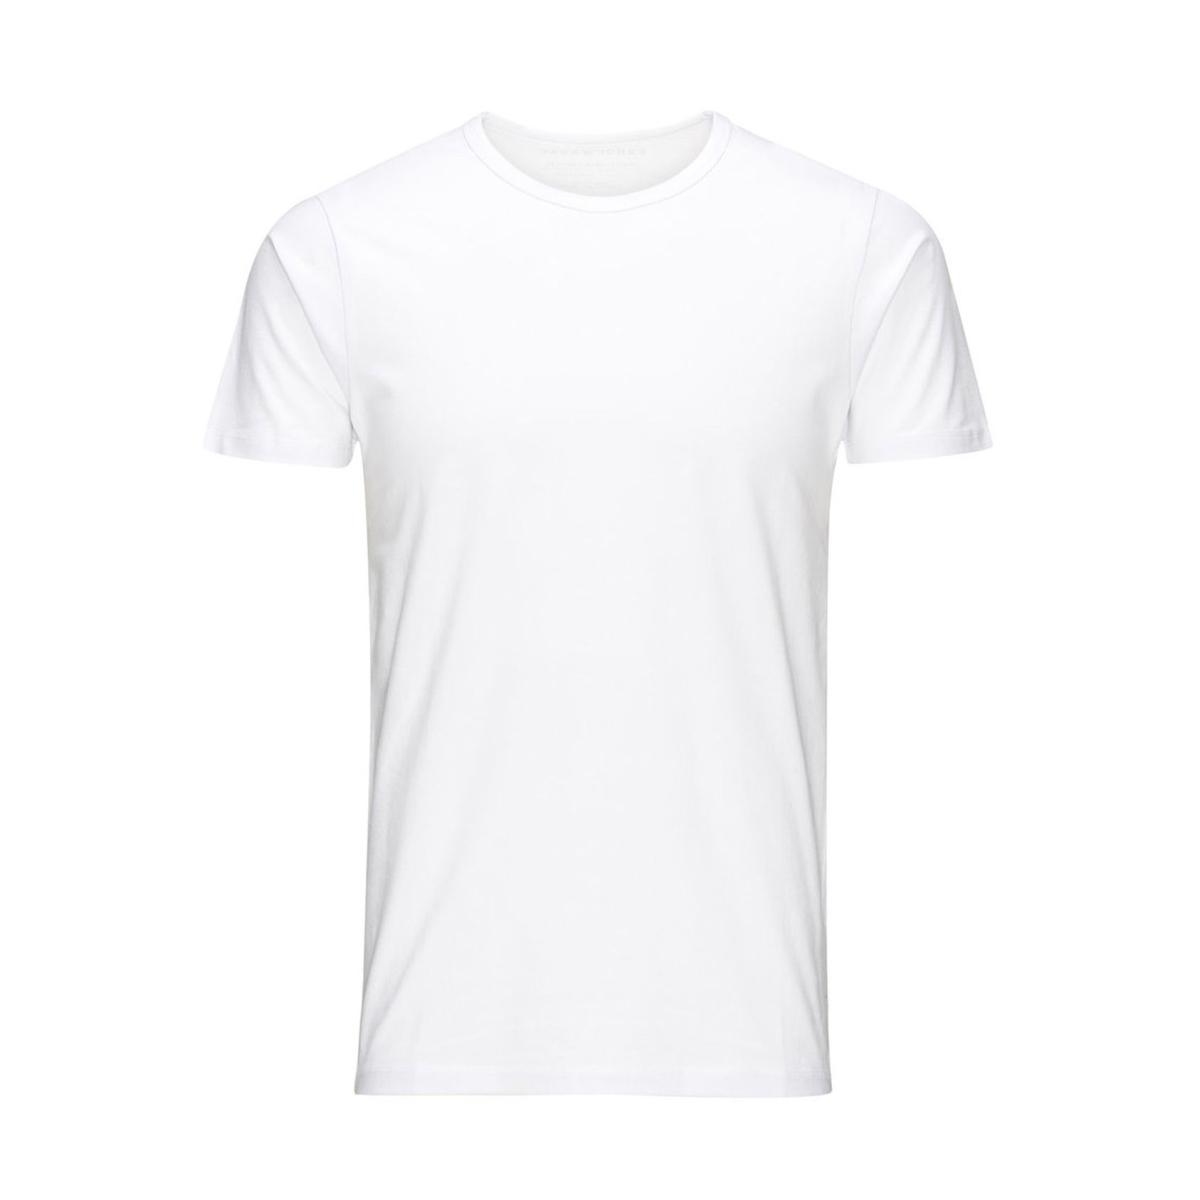 basic o-neck tee 12058529 jack & jones t-shirt opt. white